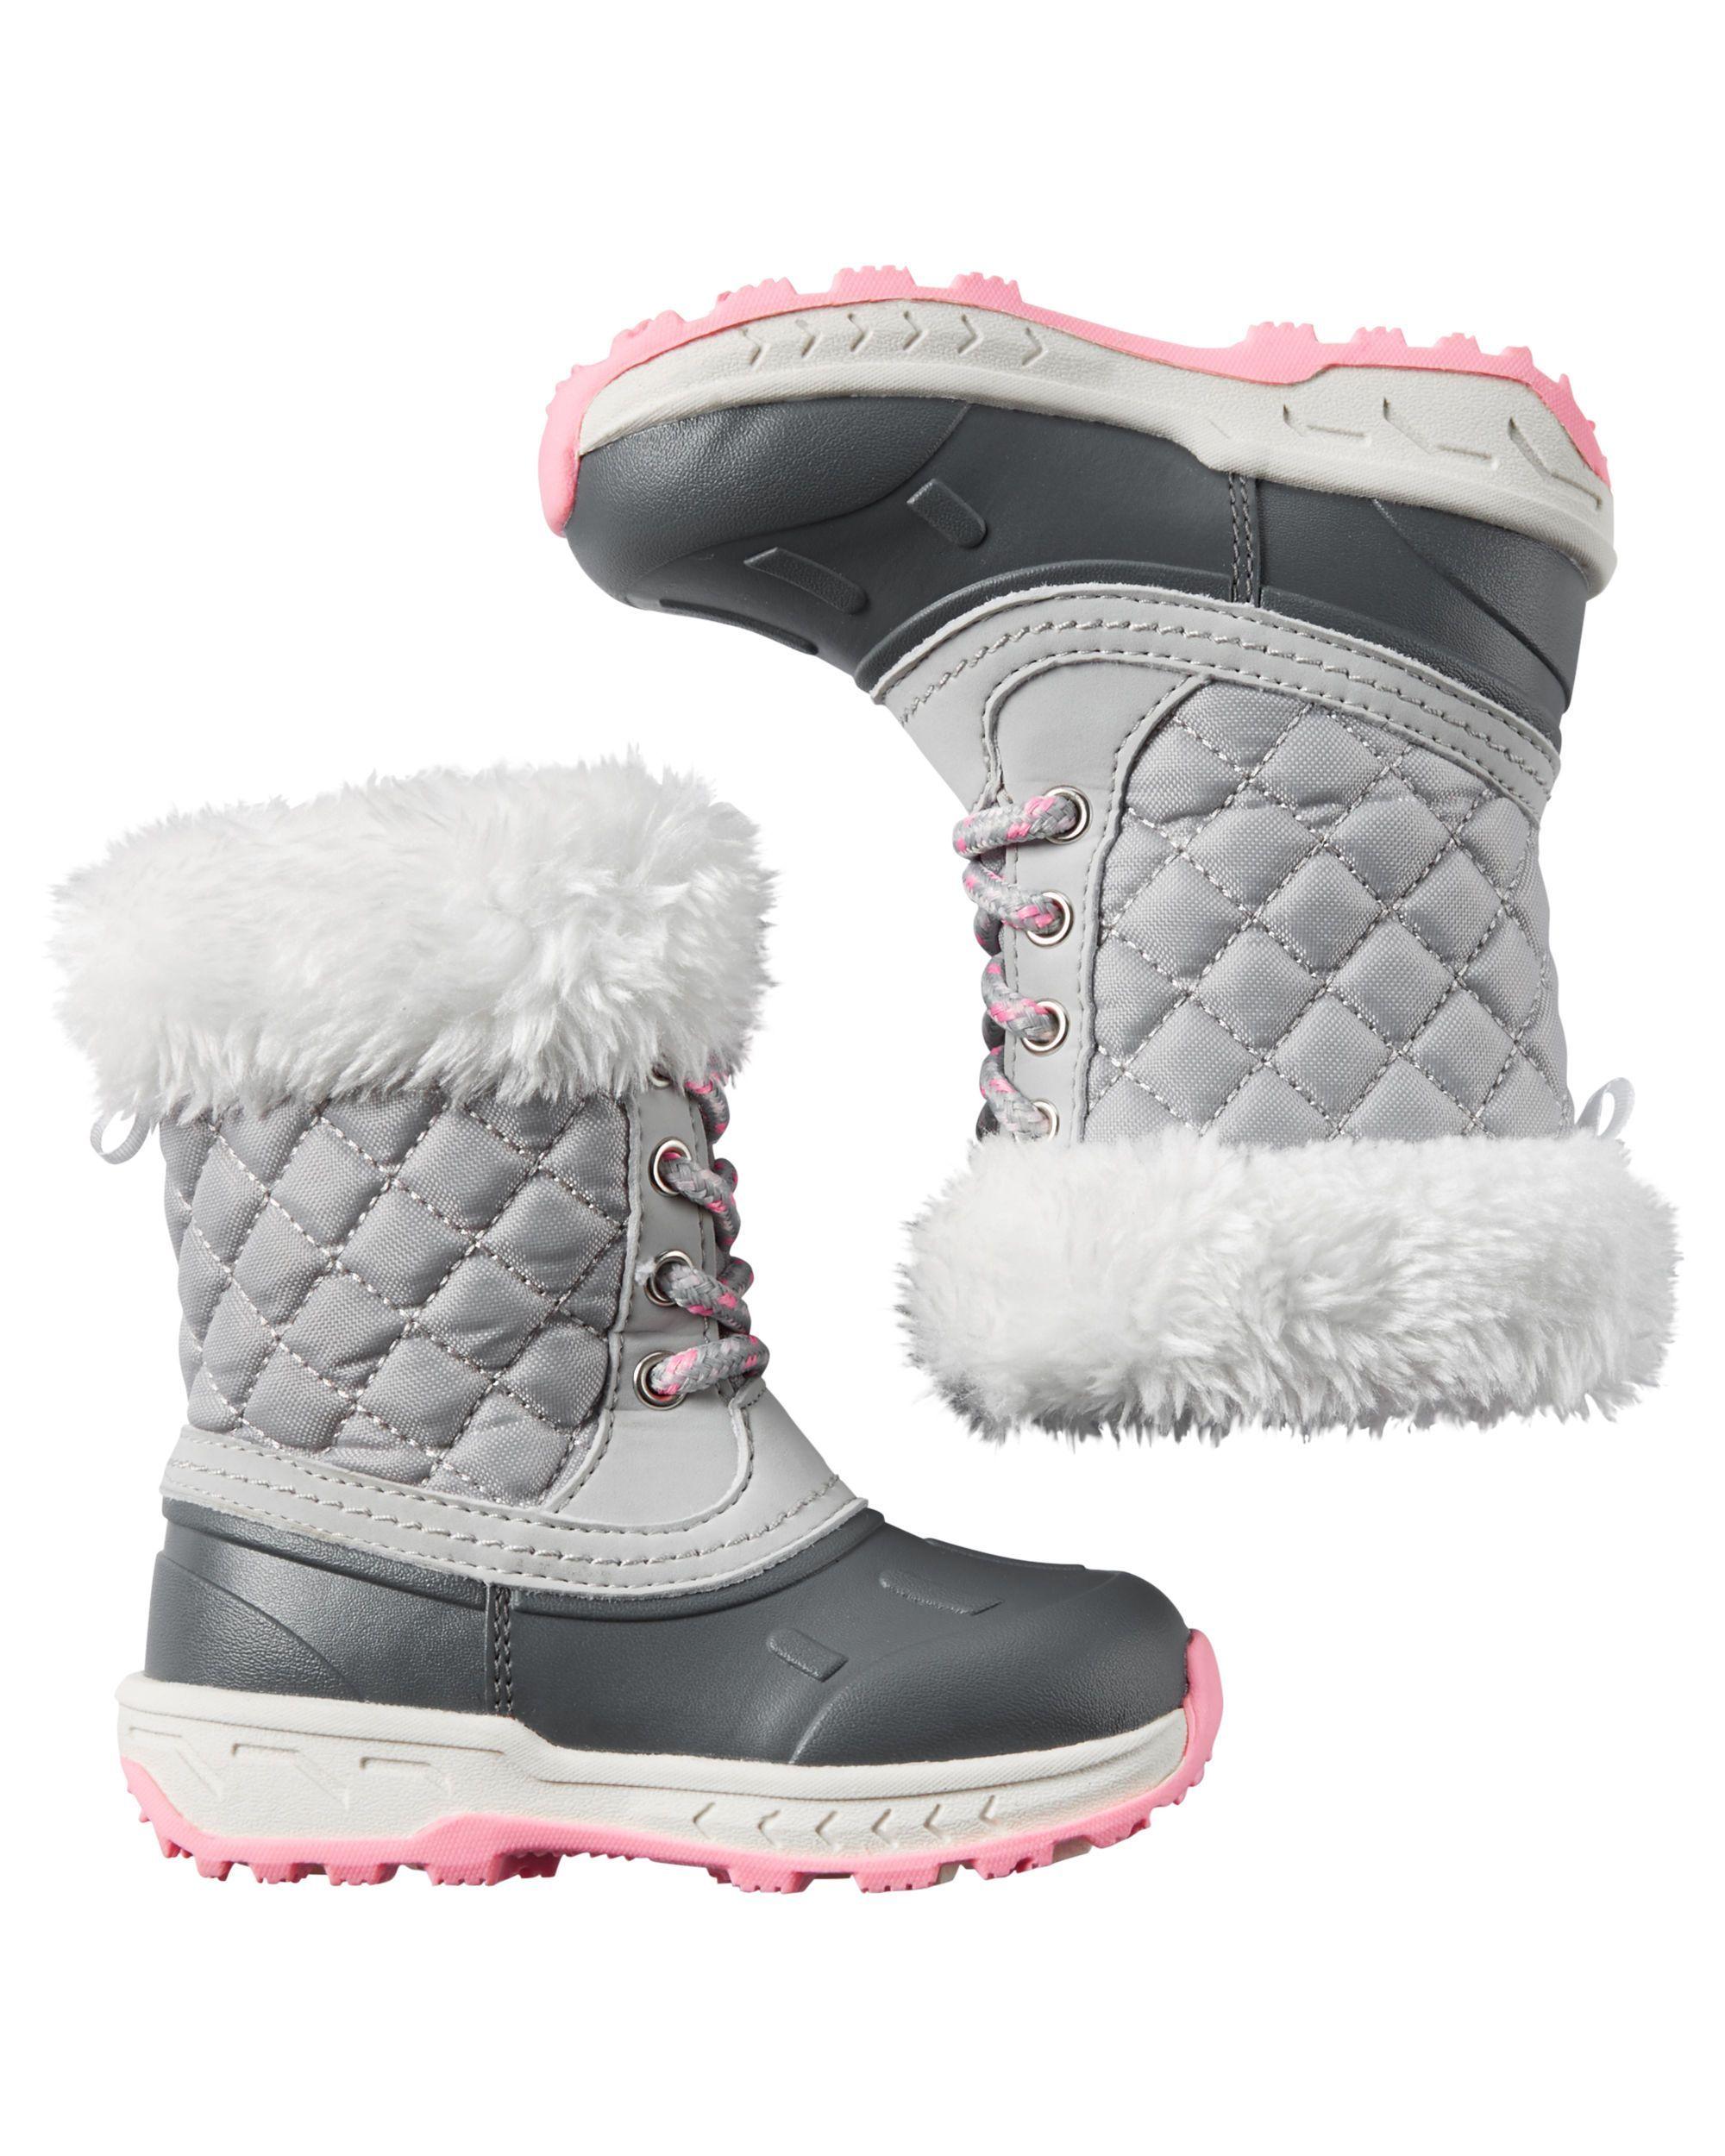 Baby stylish girl boots rare photo